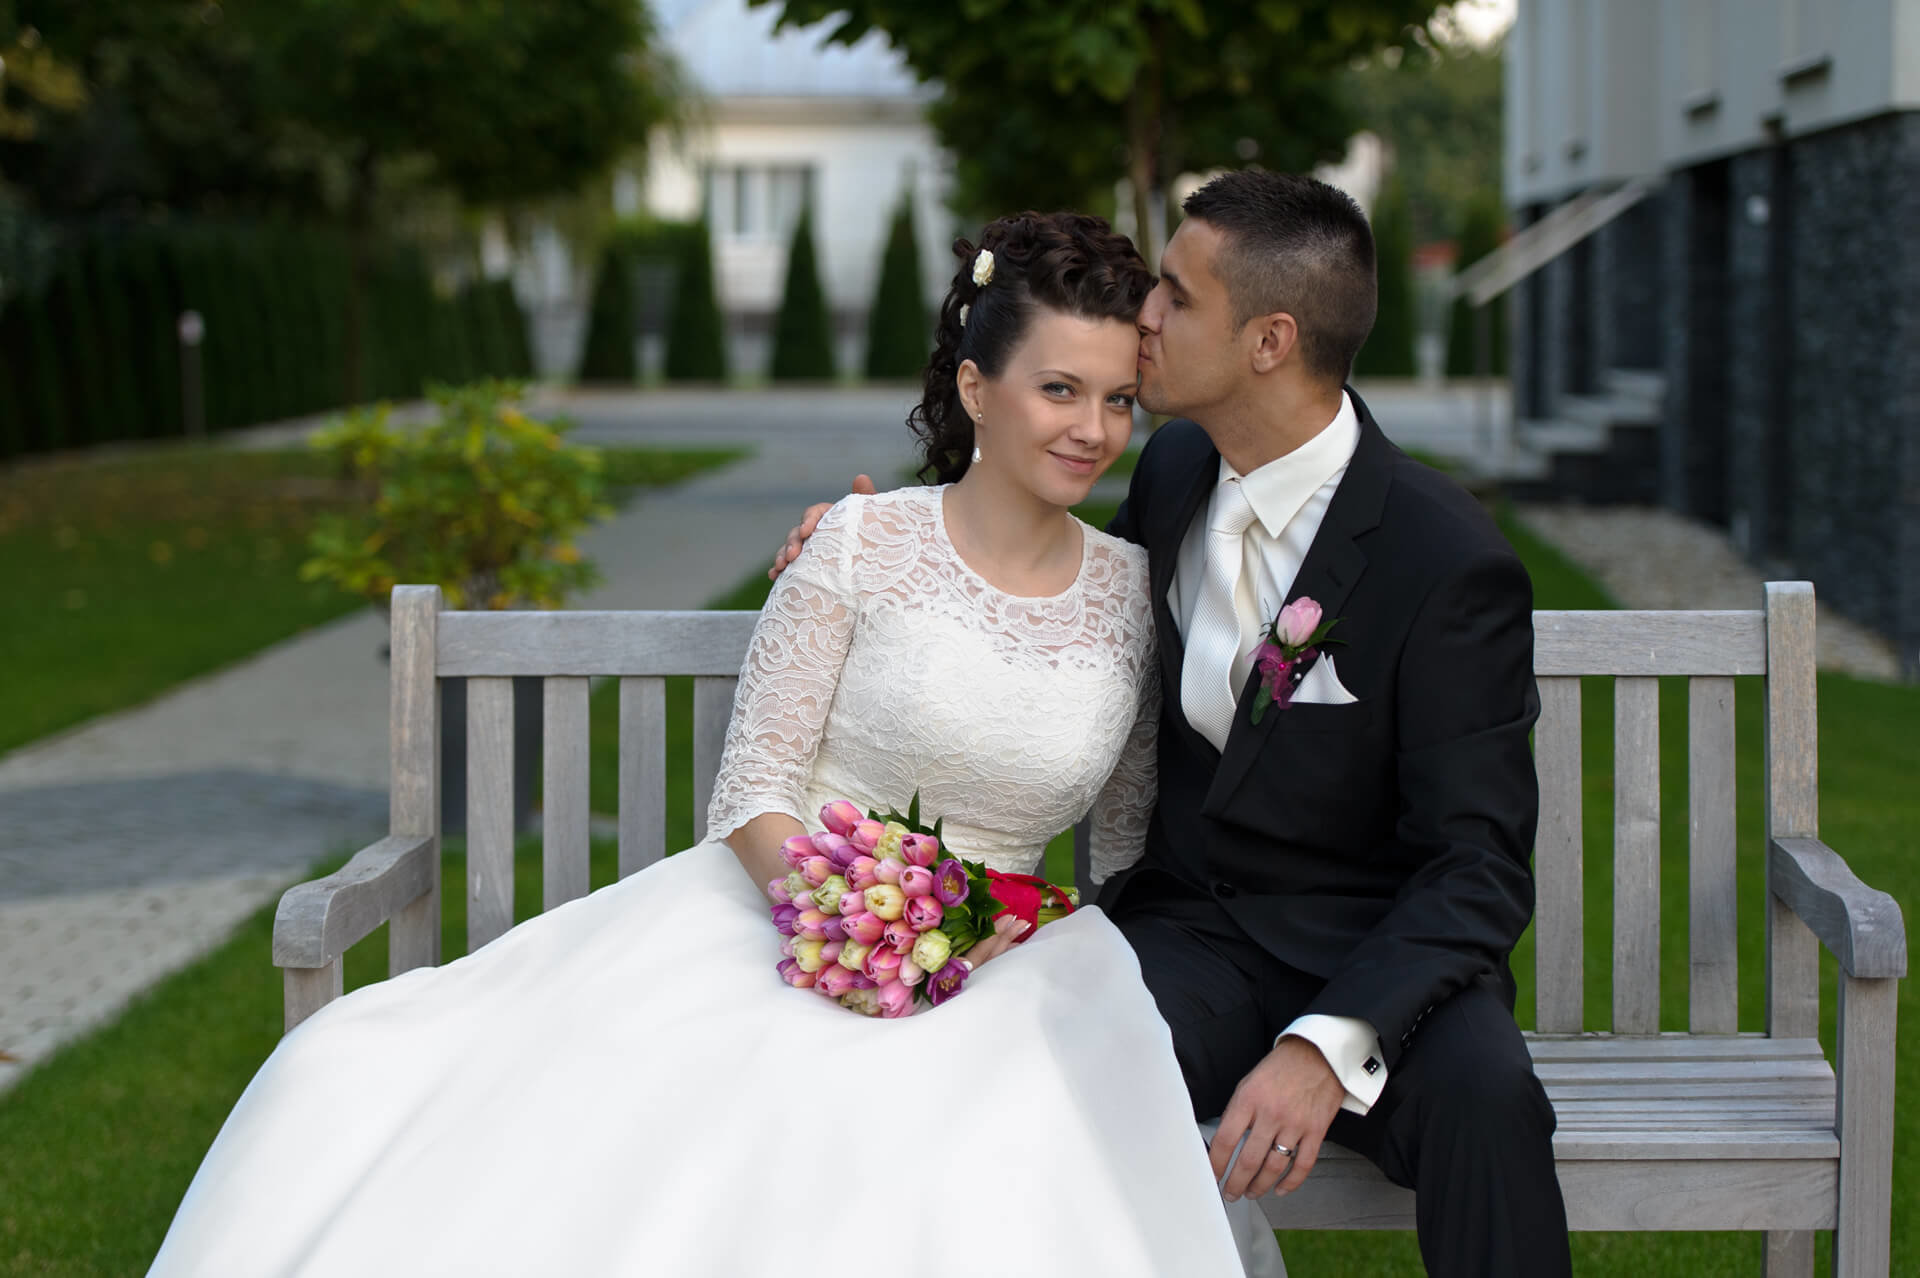 svadba svadobny portrety profesionalne fotenie fotograf Peter Norulak Kosice__11